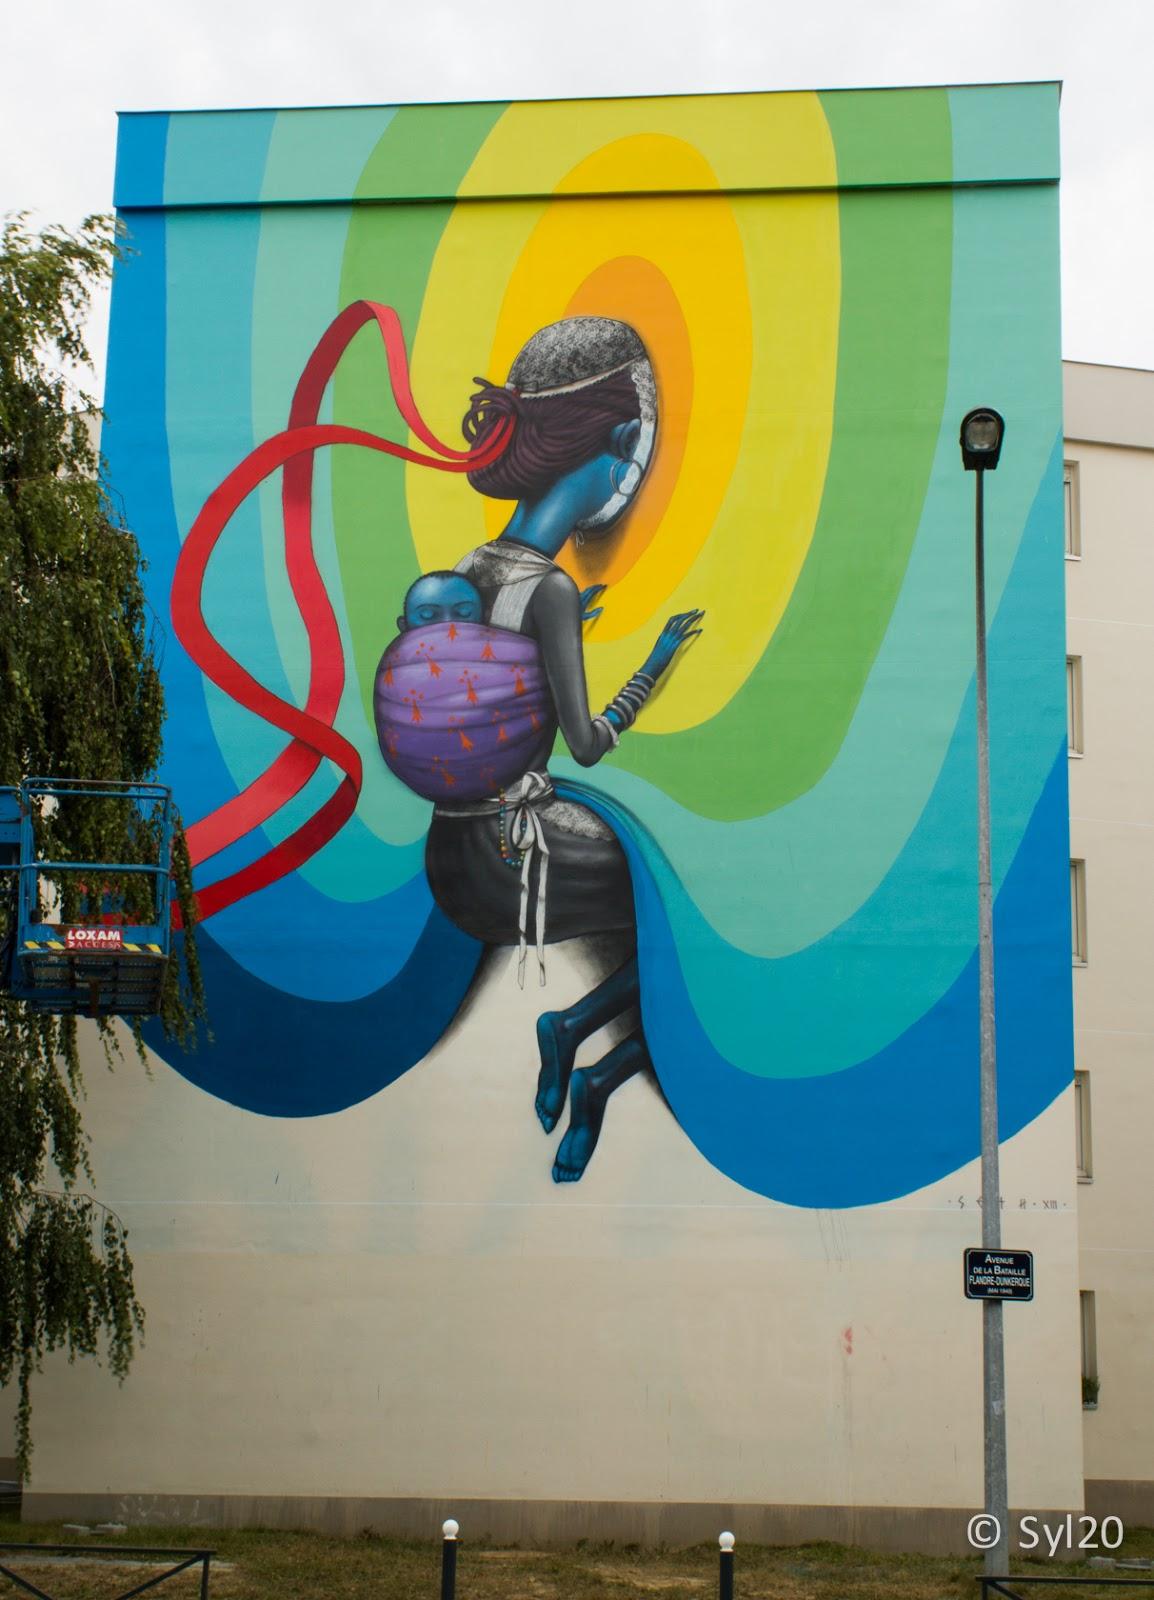 seth new street art for teenage kicks festival in rennes france streetartnews streetartnews. Black Bedroom Furniture Sets. Home Design Ideas